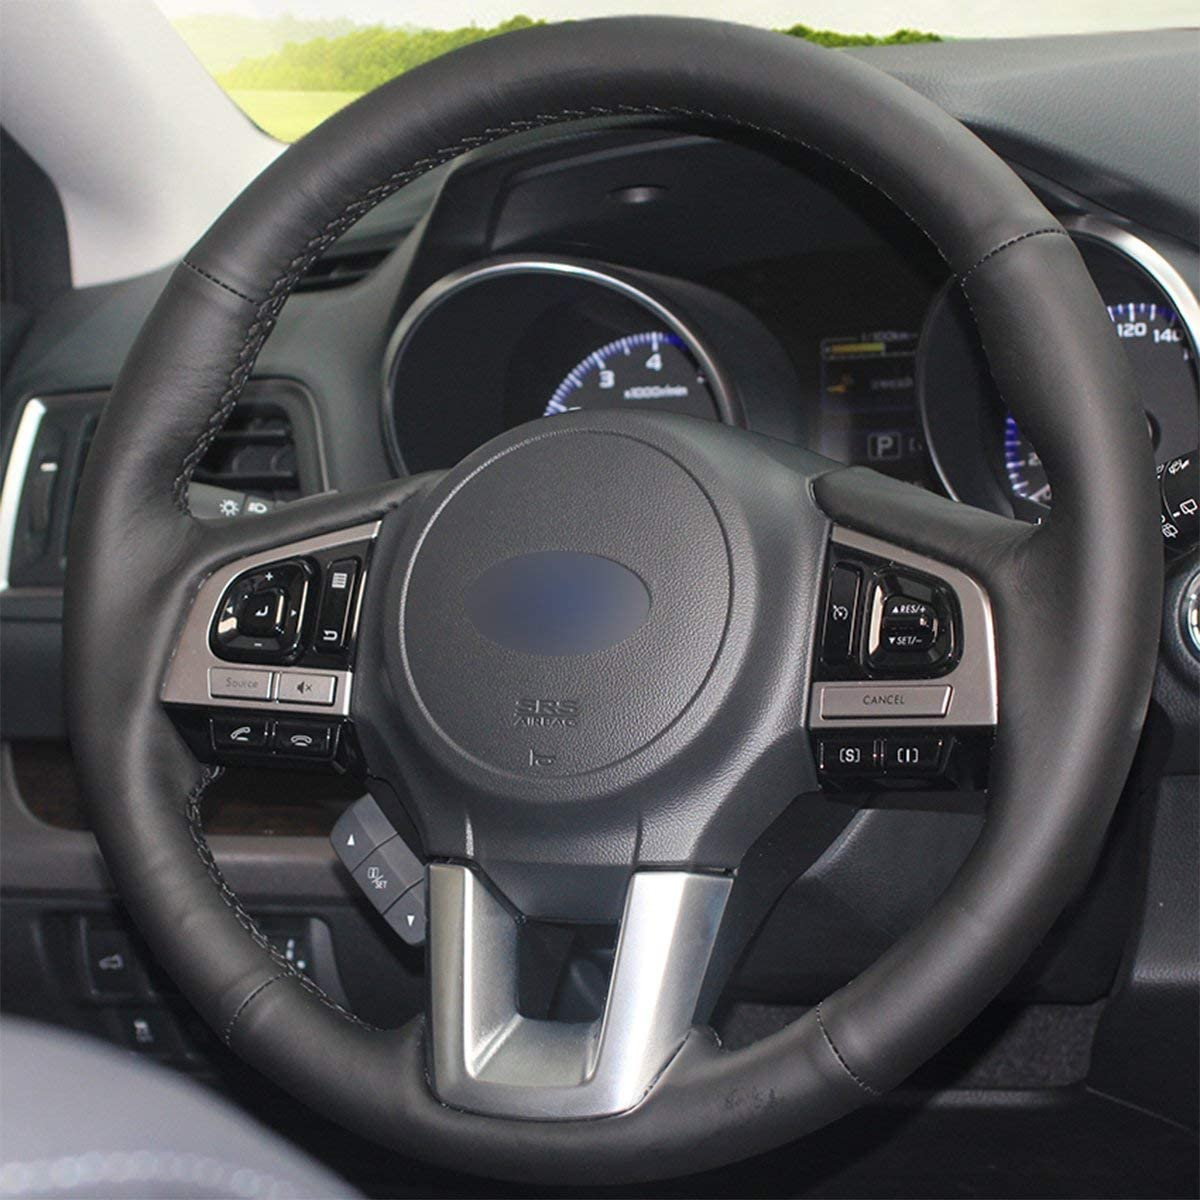 Subaru Liberty all Models Genuine Leather Steering Wheel Cover